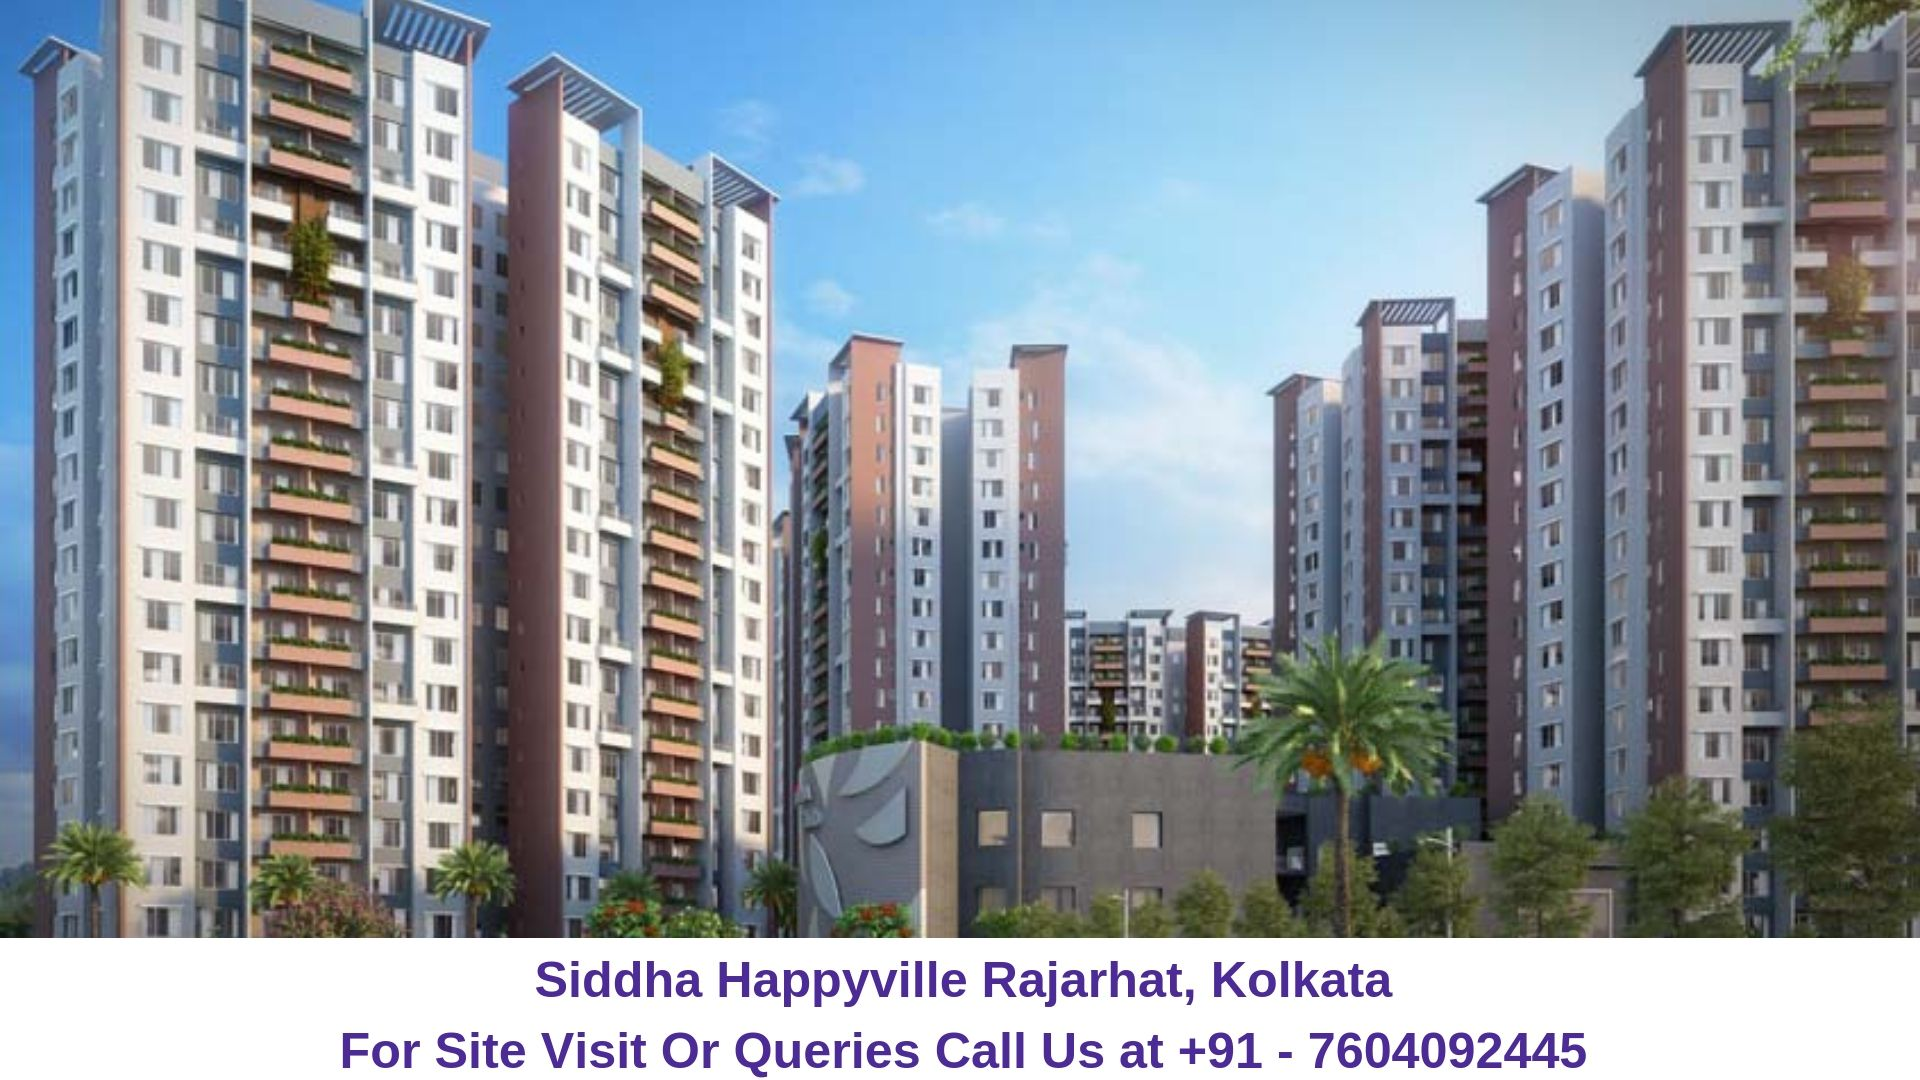 Siddha Happyville Rajarhat, Kolkata